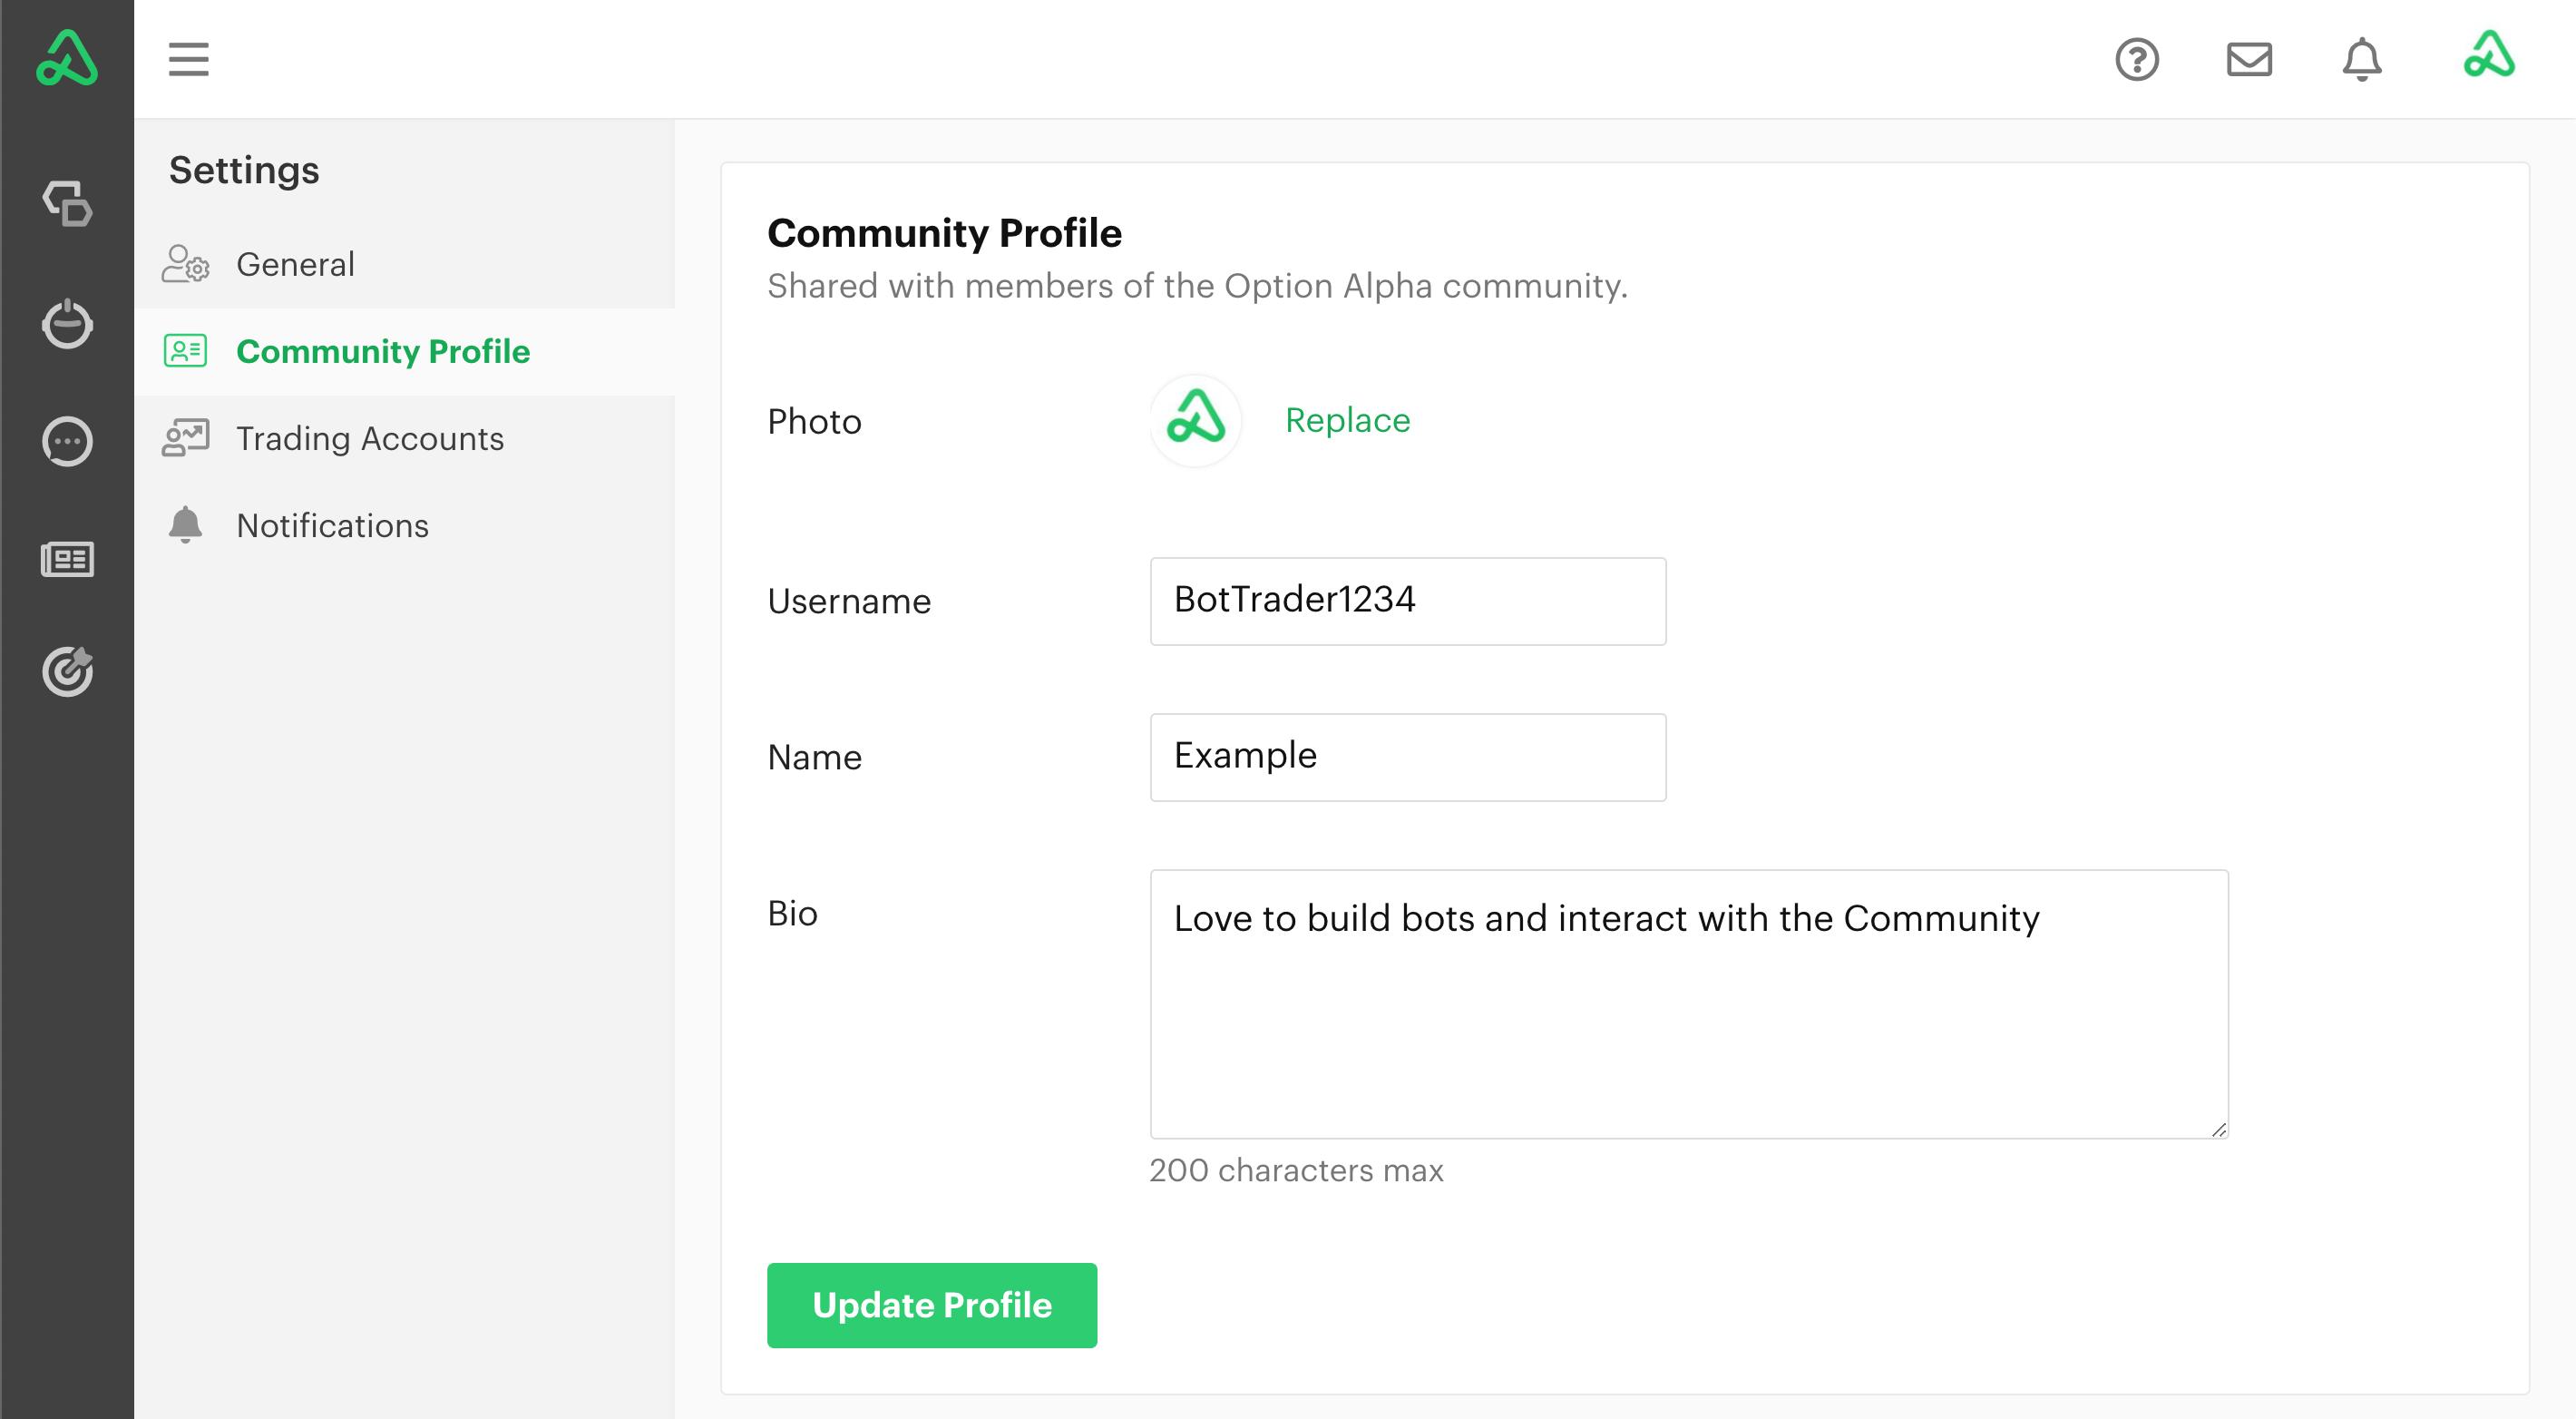 Community profile settings